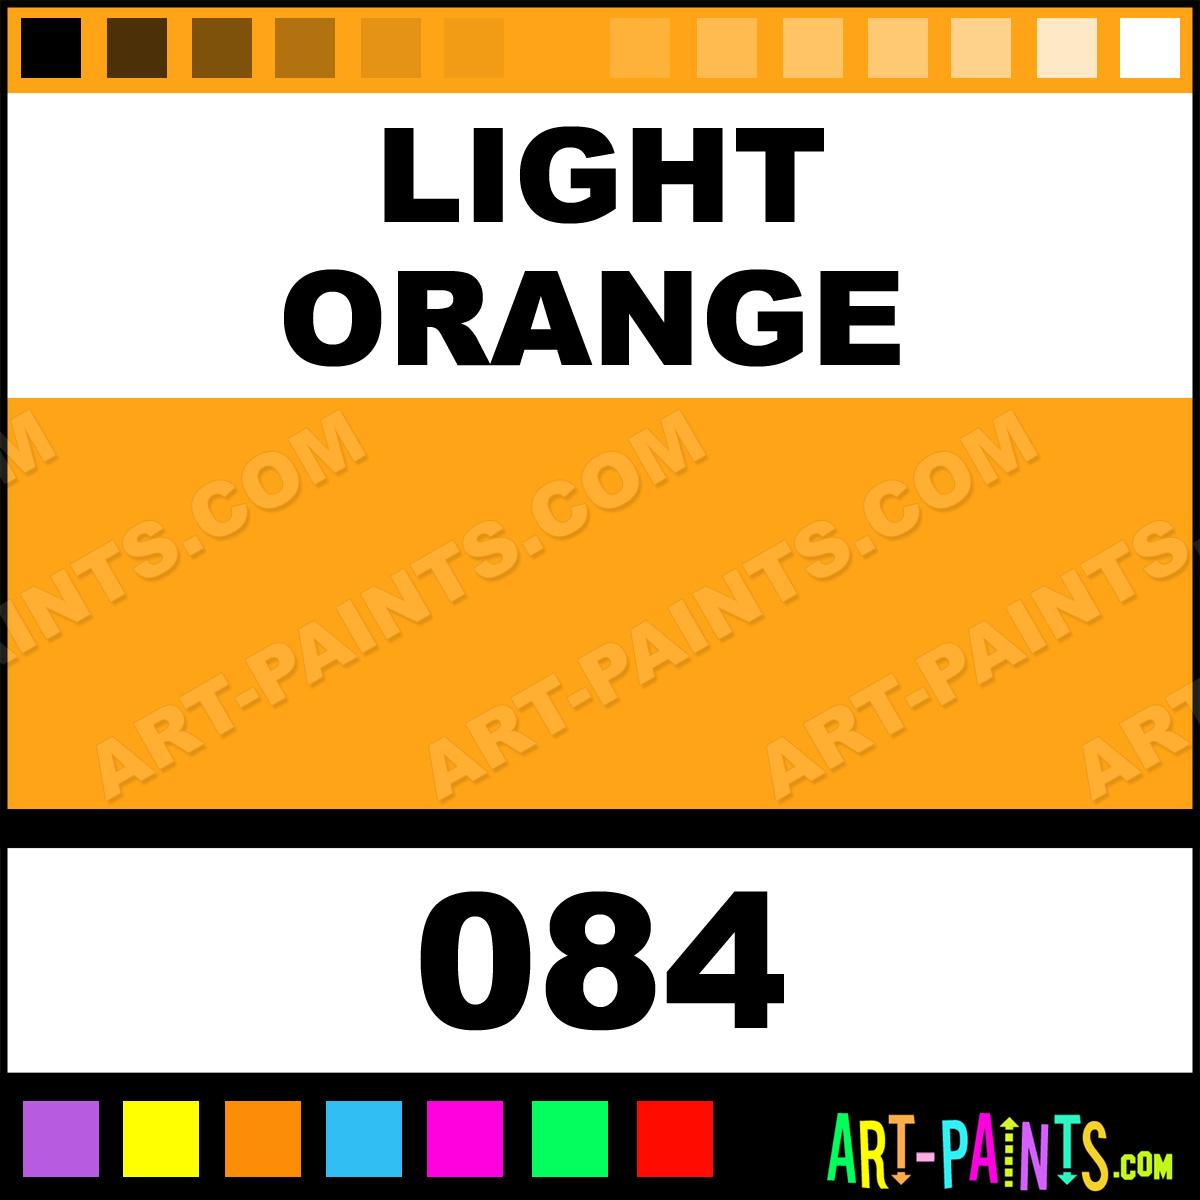 Light Orange High Pressure Spray Paints 084 Light